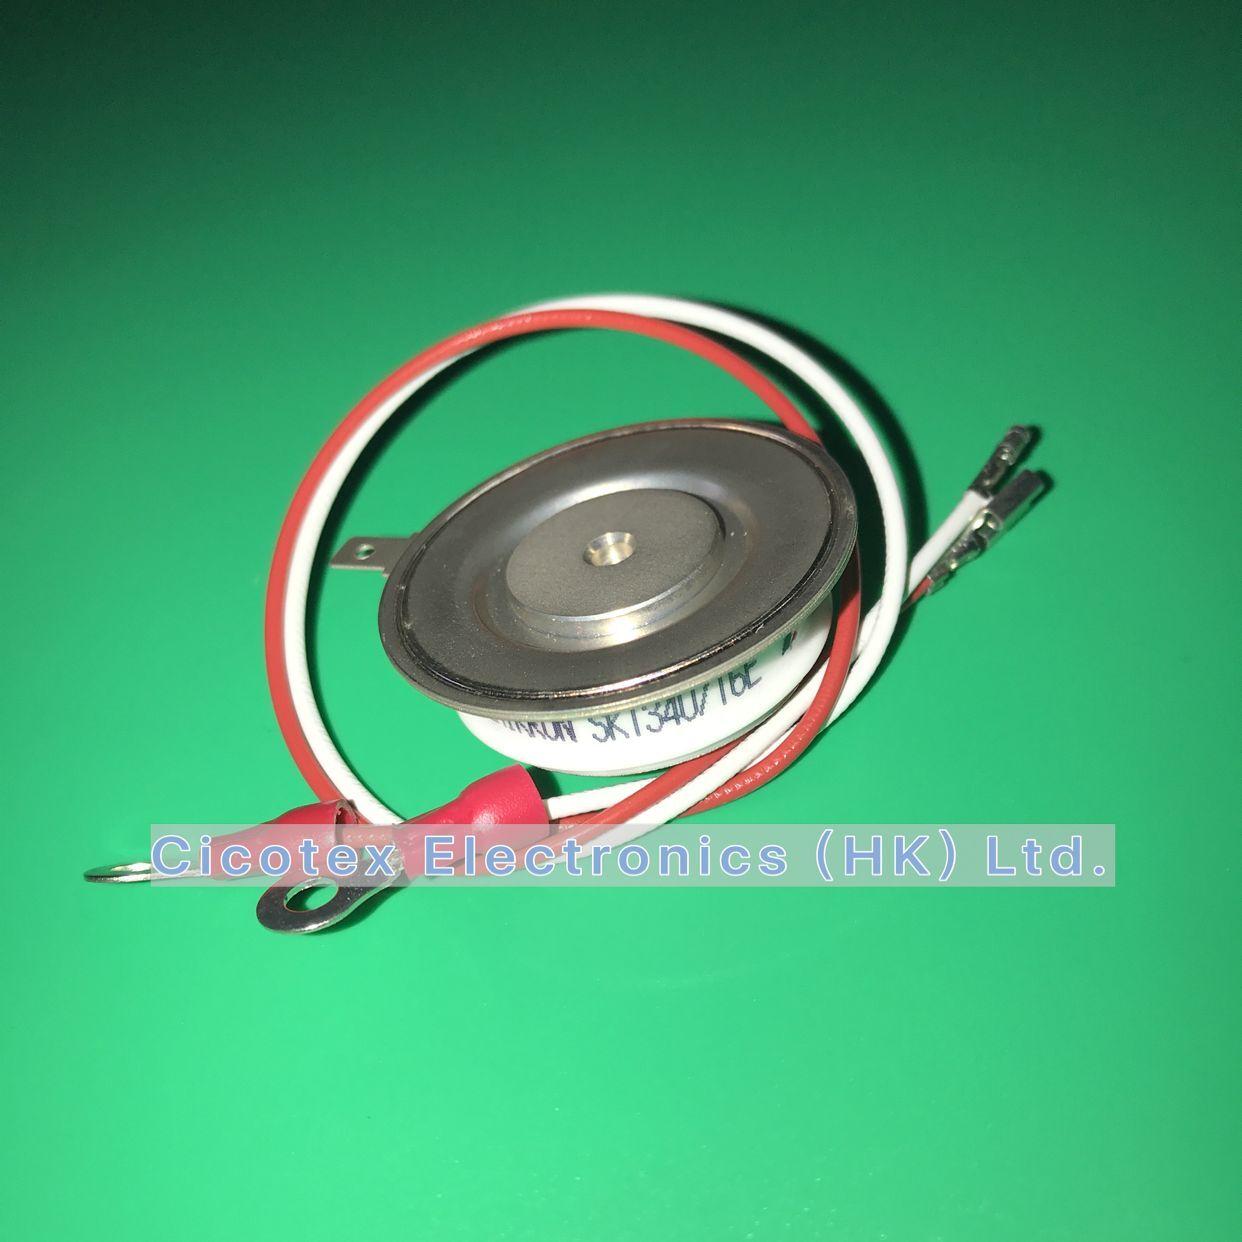 SKT340/16E модуль SKT 340/16 E линия тиристора IGBT капсула 1600V 340A чехол B8 TO-200AB SKT340-16E